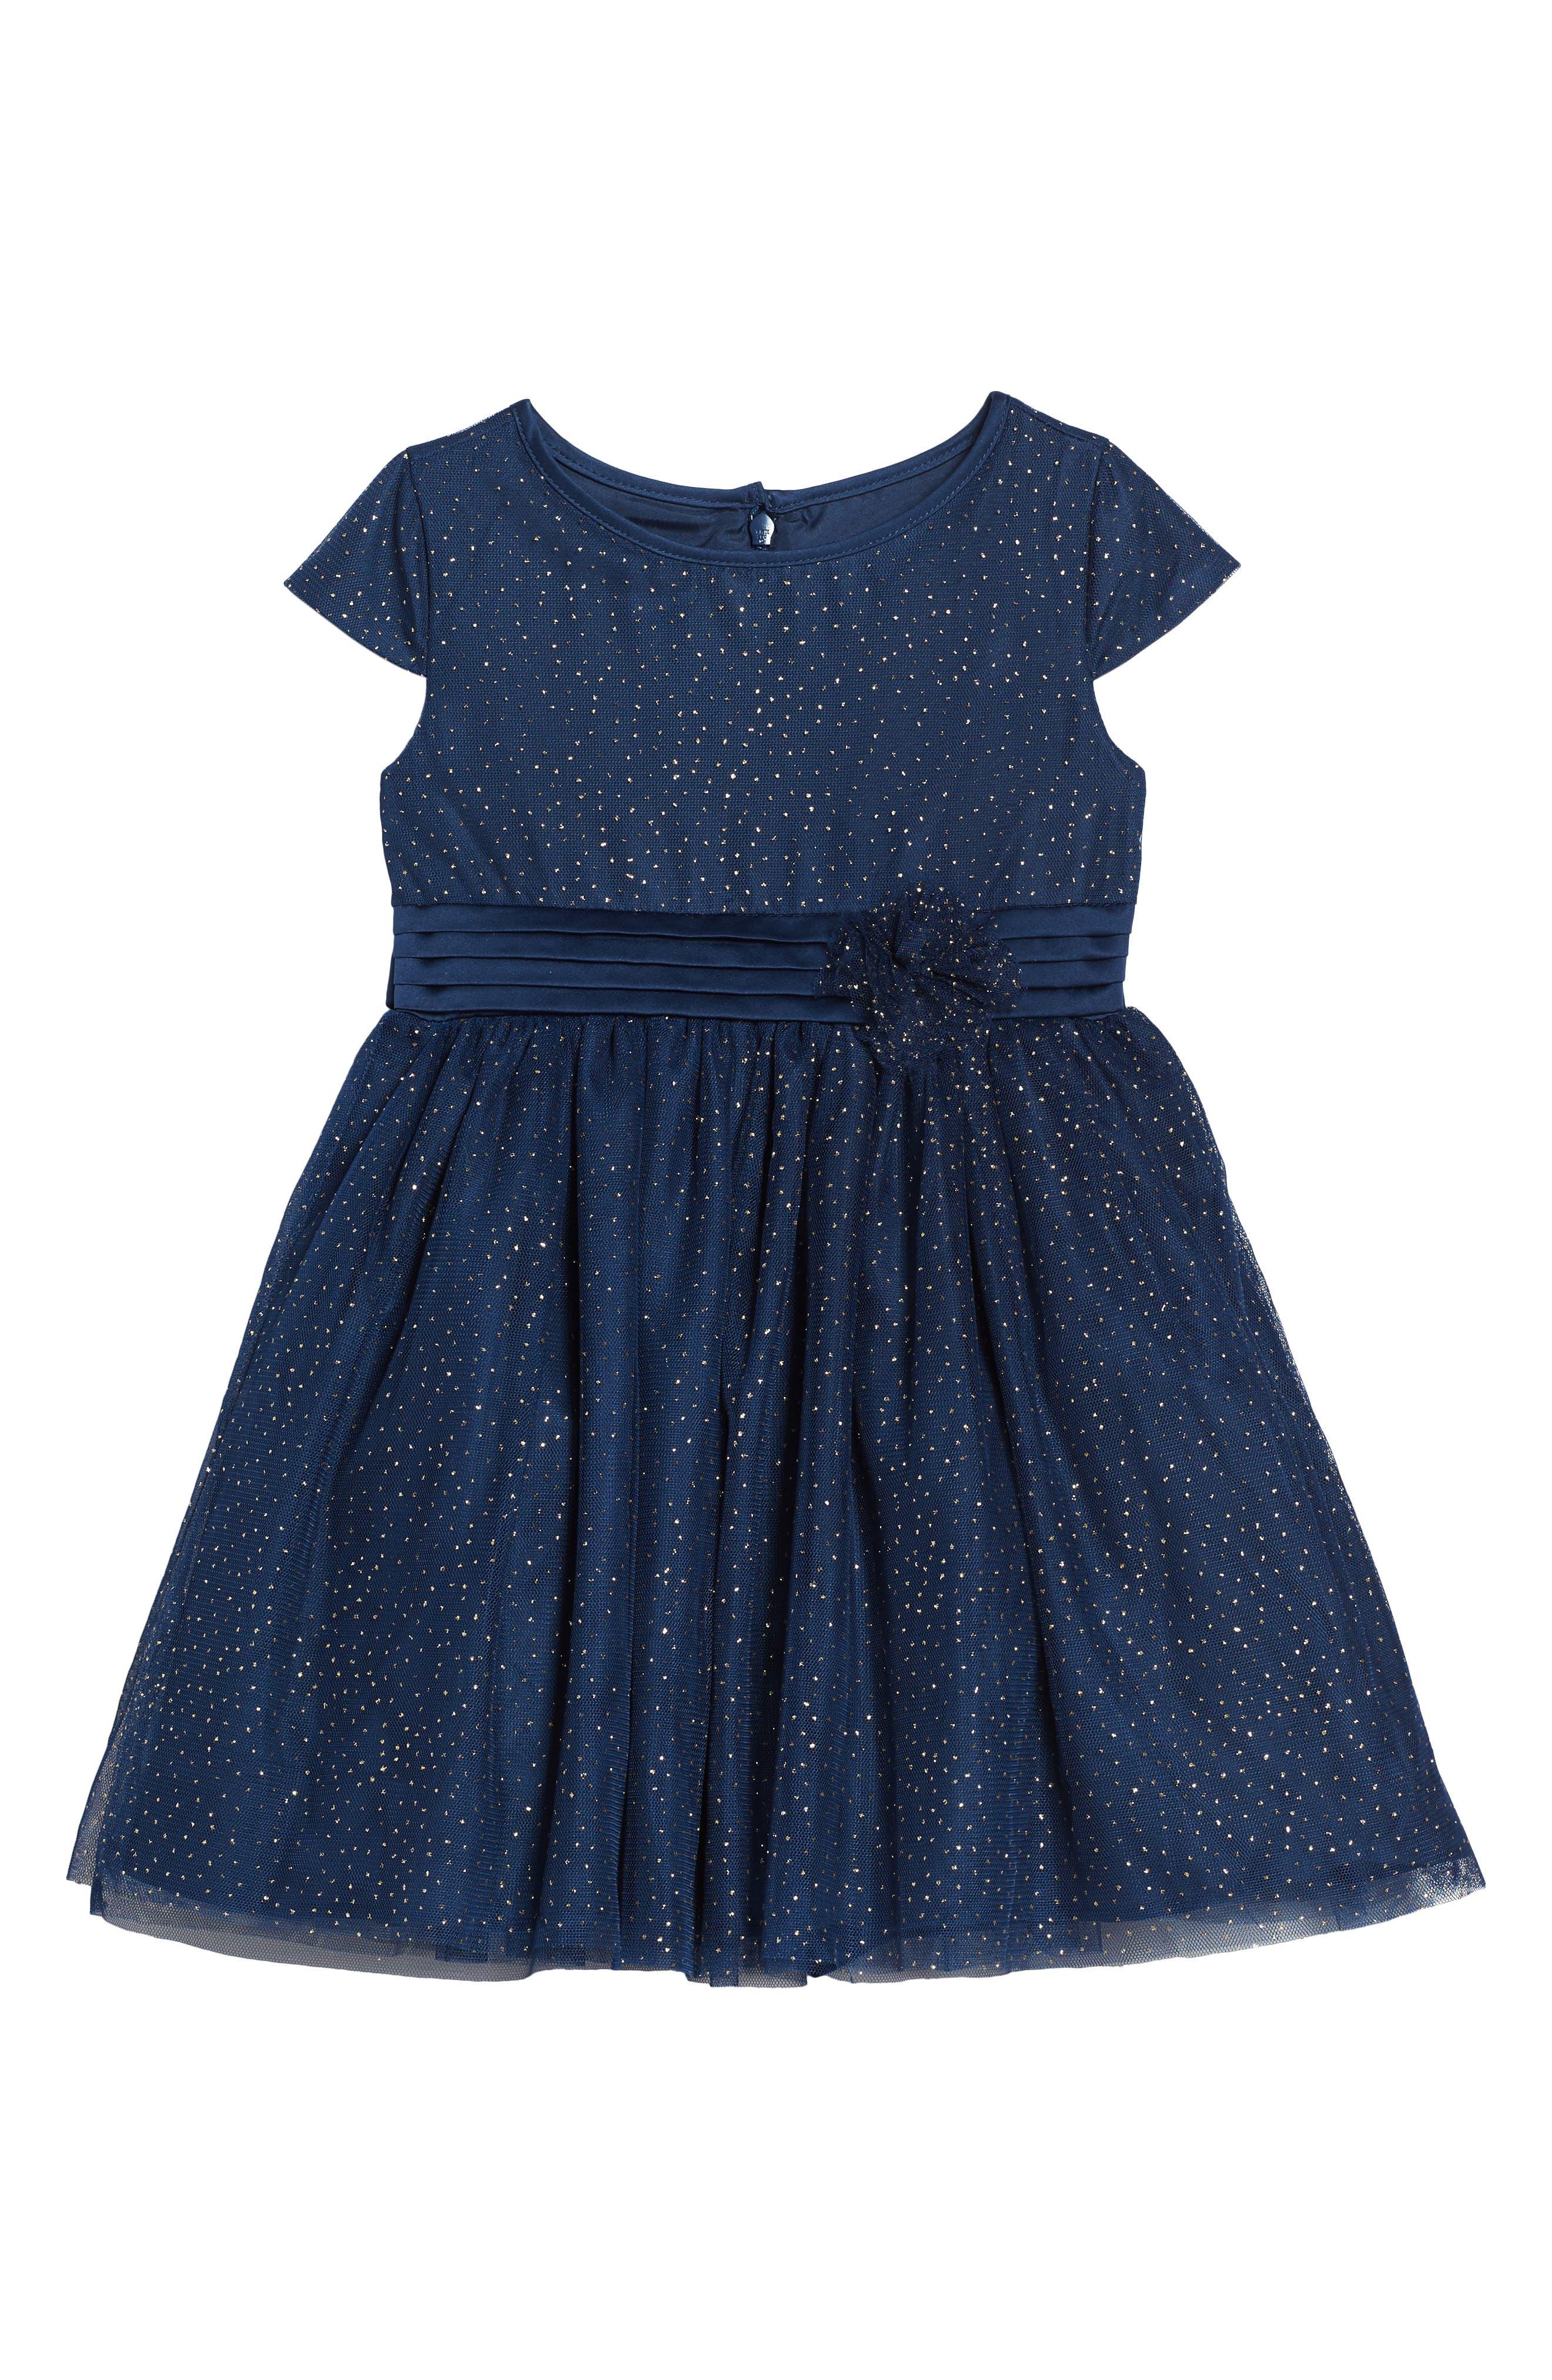 Illusion Mesh Party Dress,                         Main,                         color, Navy